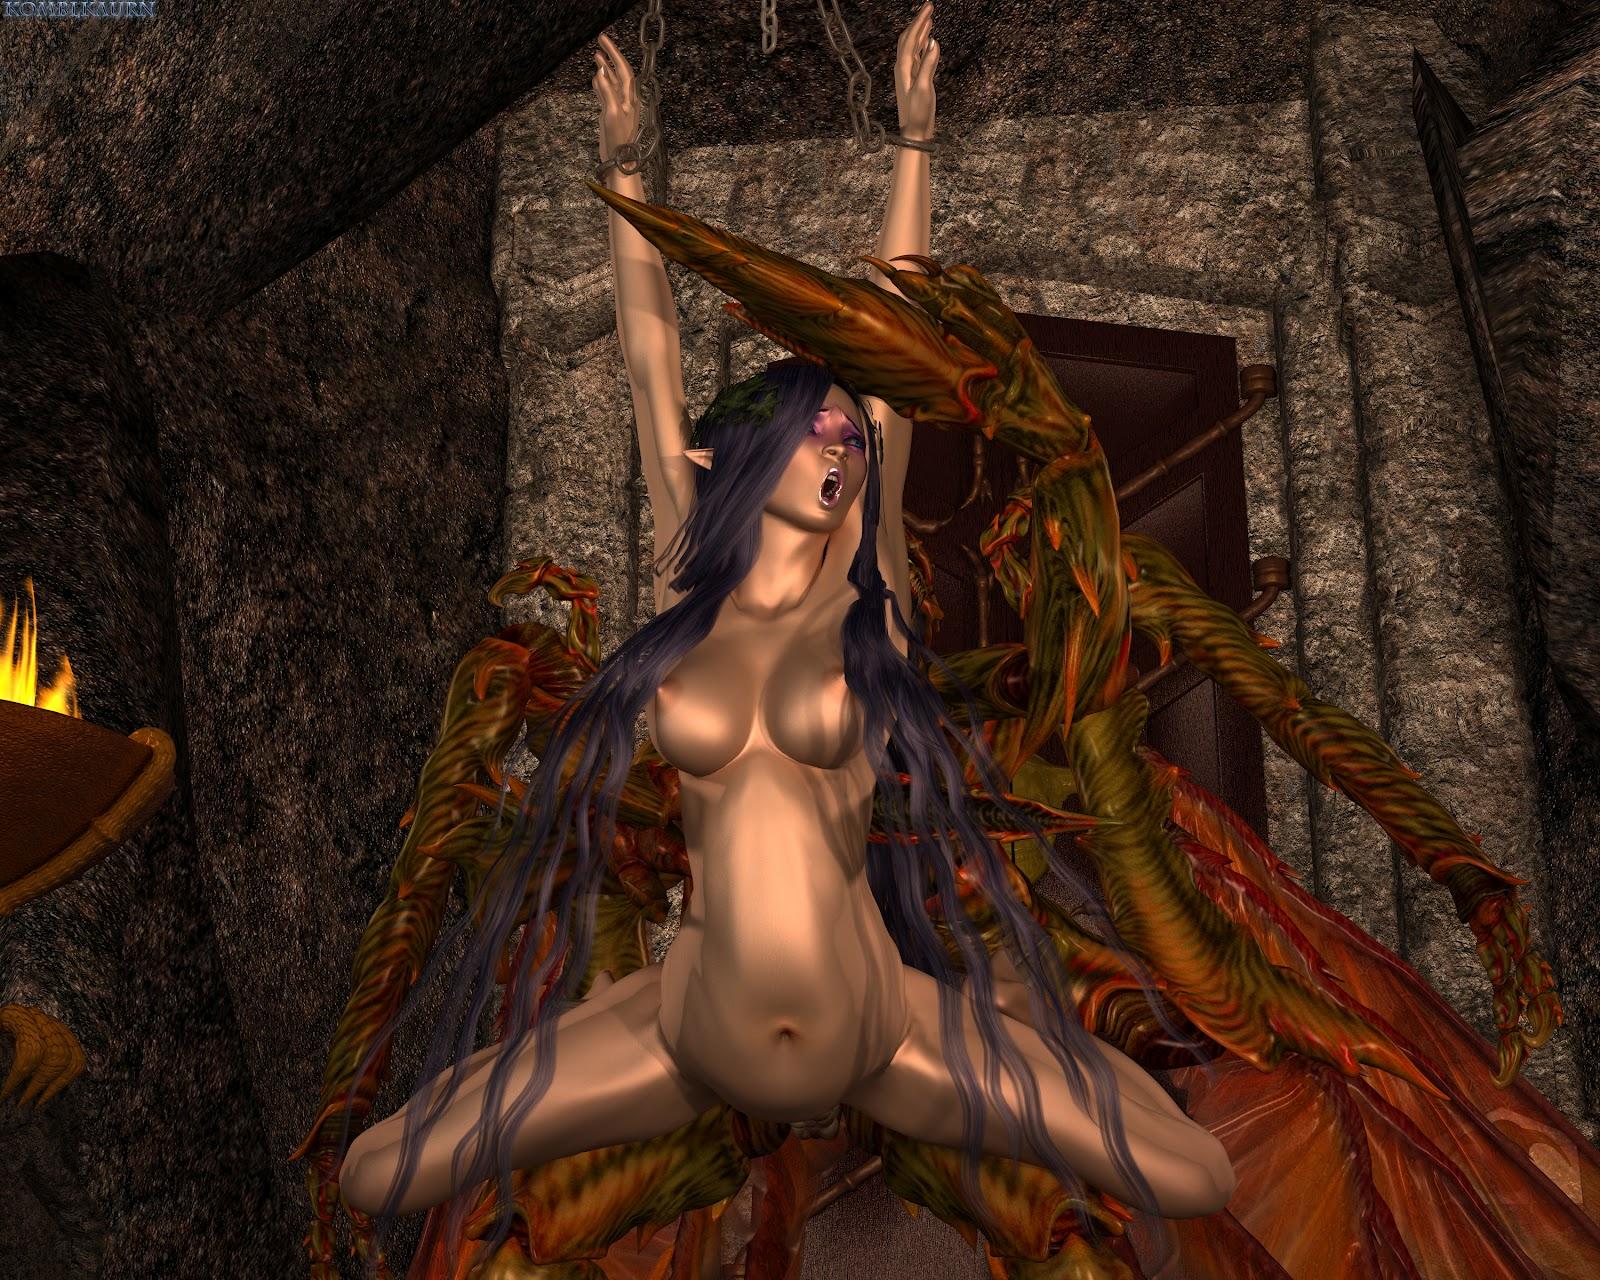 Megamn nt warrior hentai naked vids